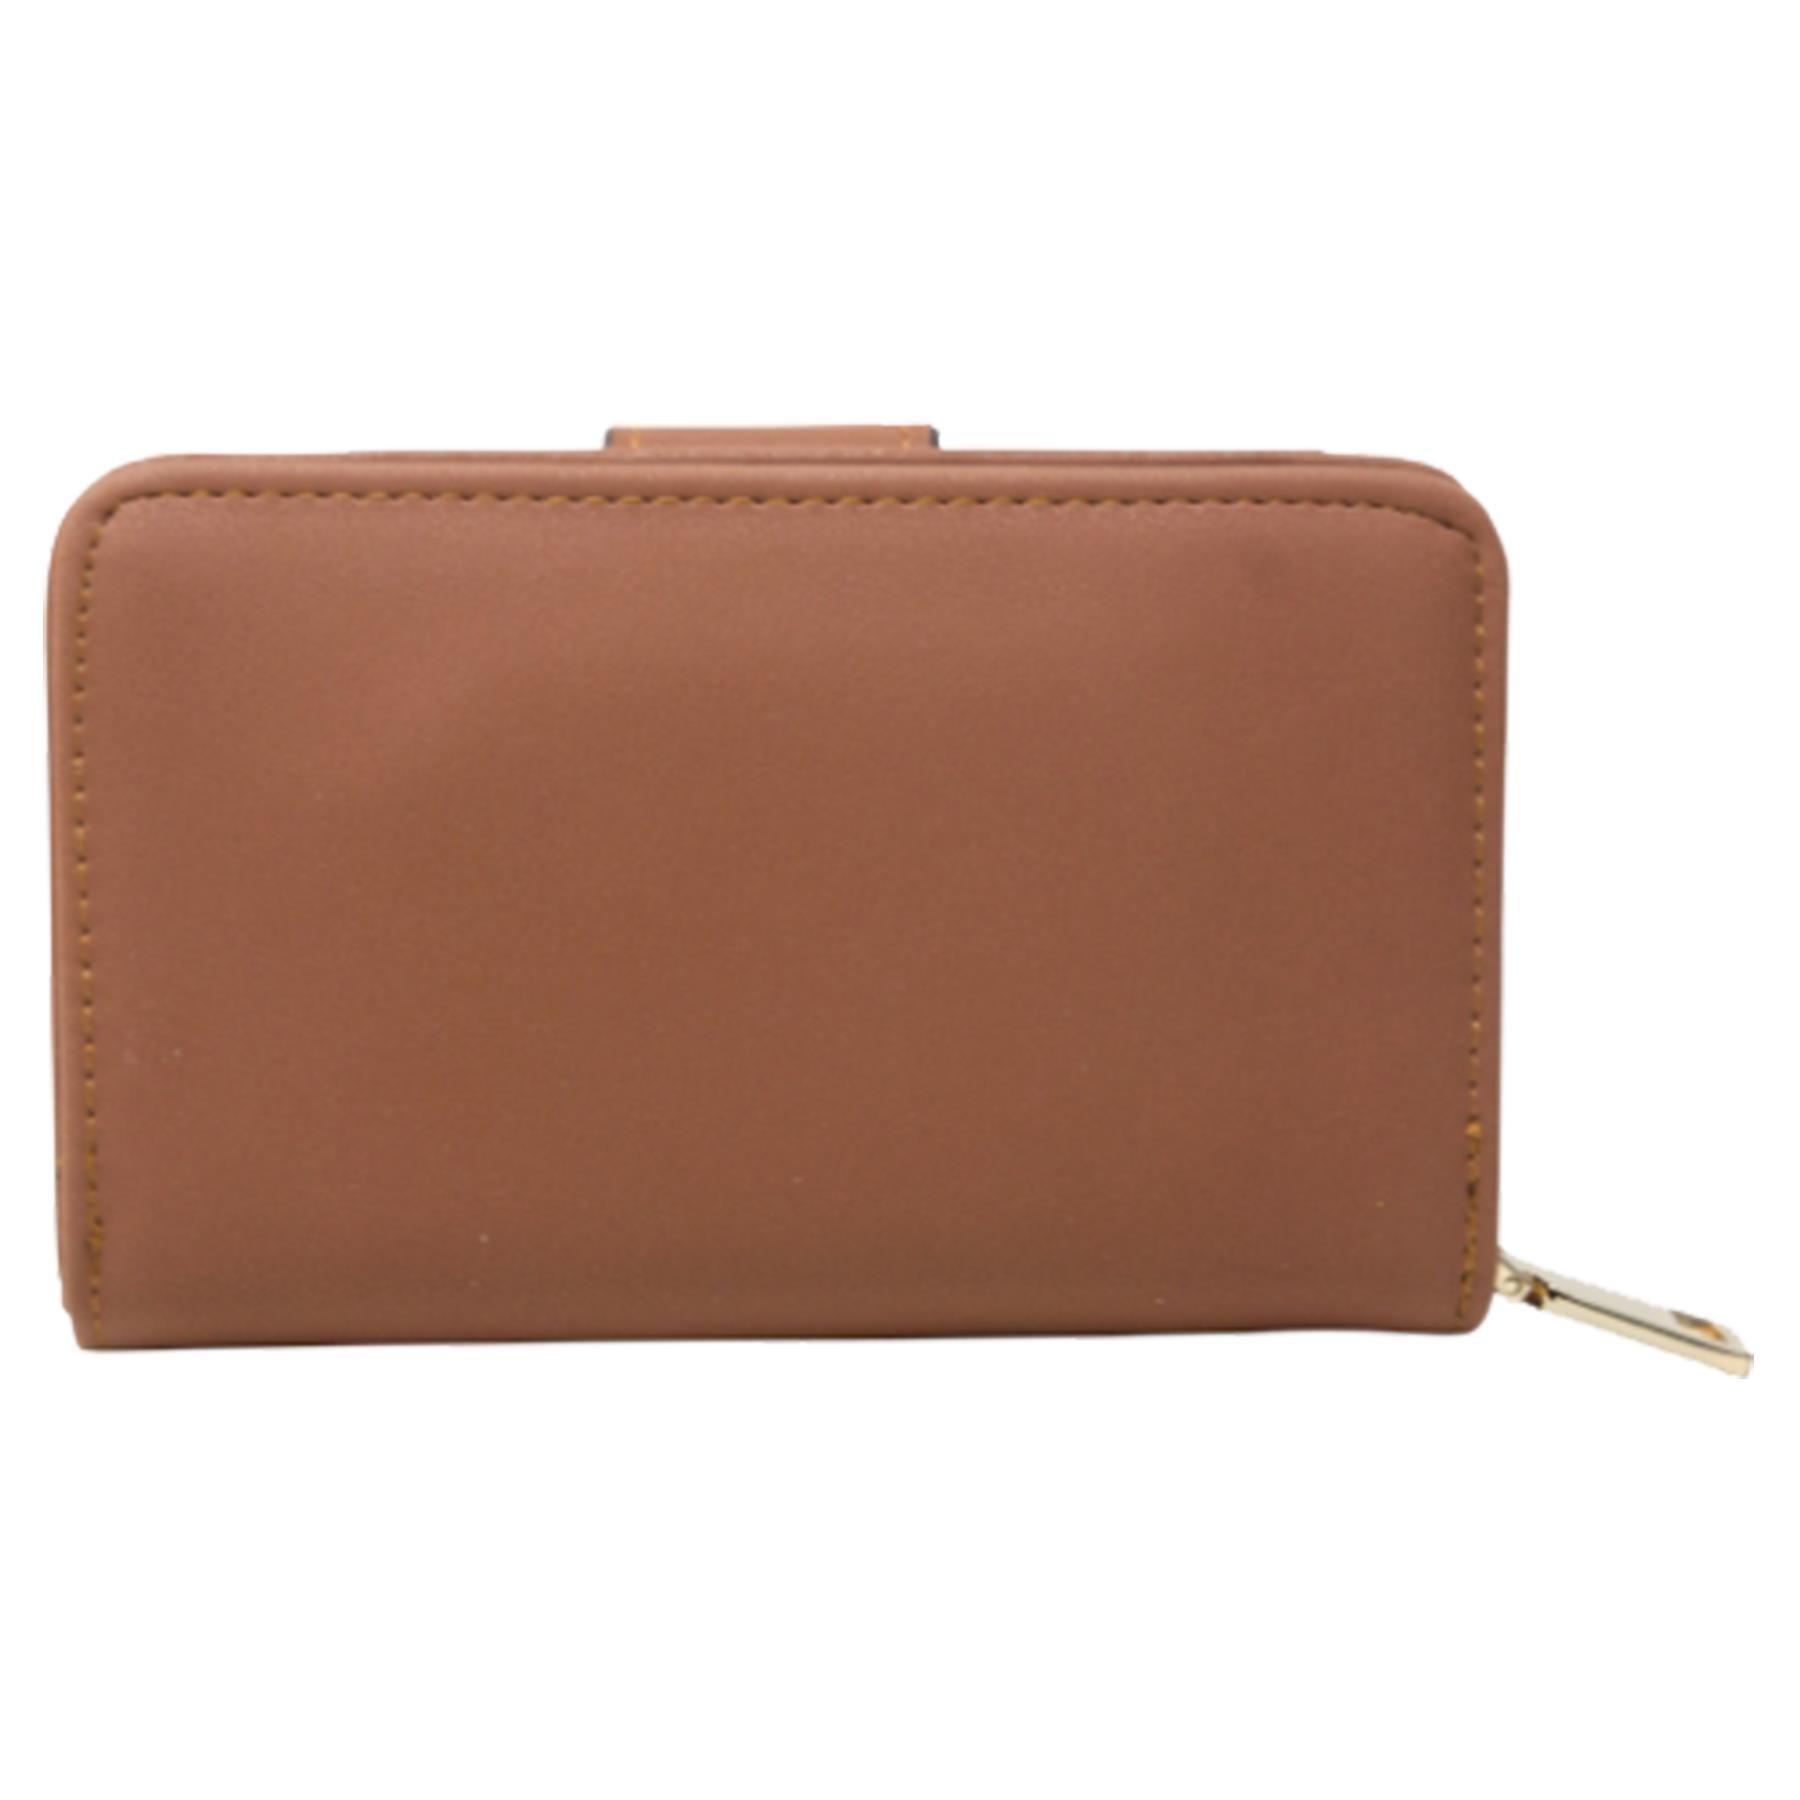 New-Ladies-Card-Slots-Zipped-Pocket-Faux-Leather-Basic-Wallet-Purse thumbnail 11